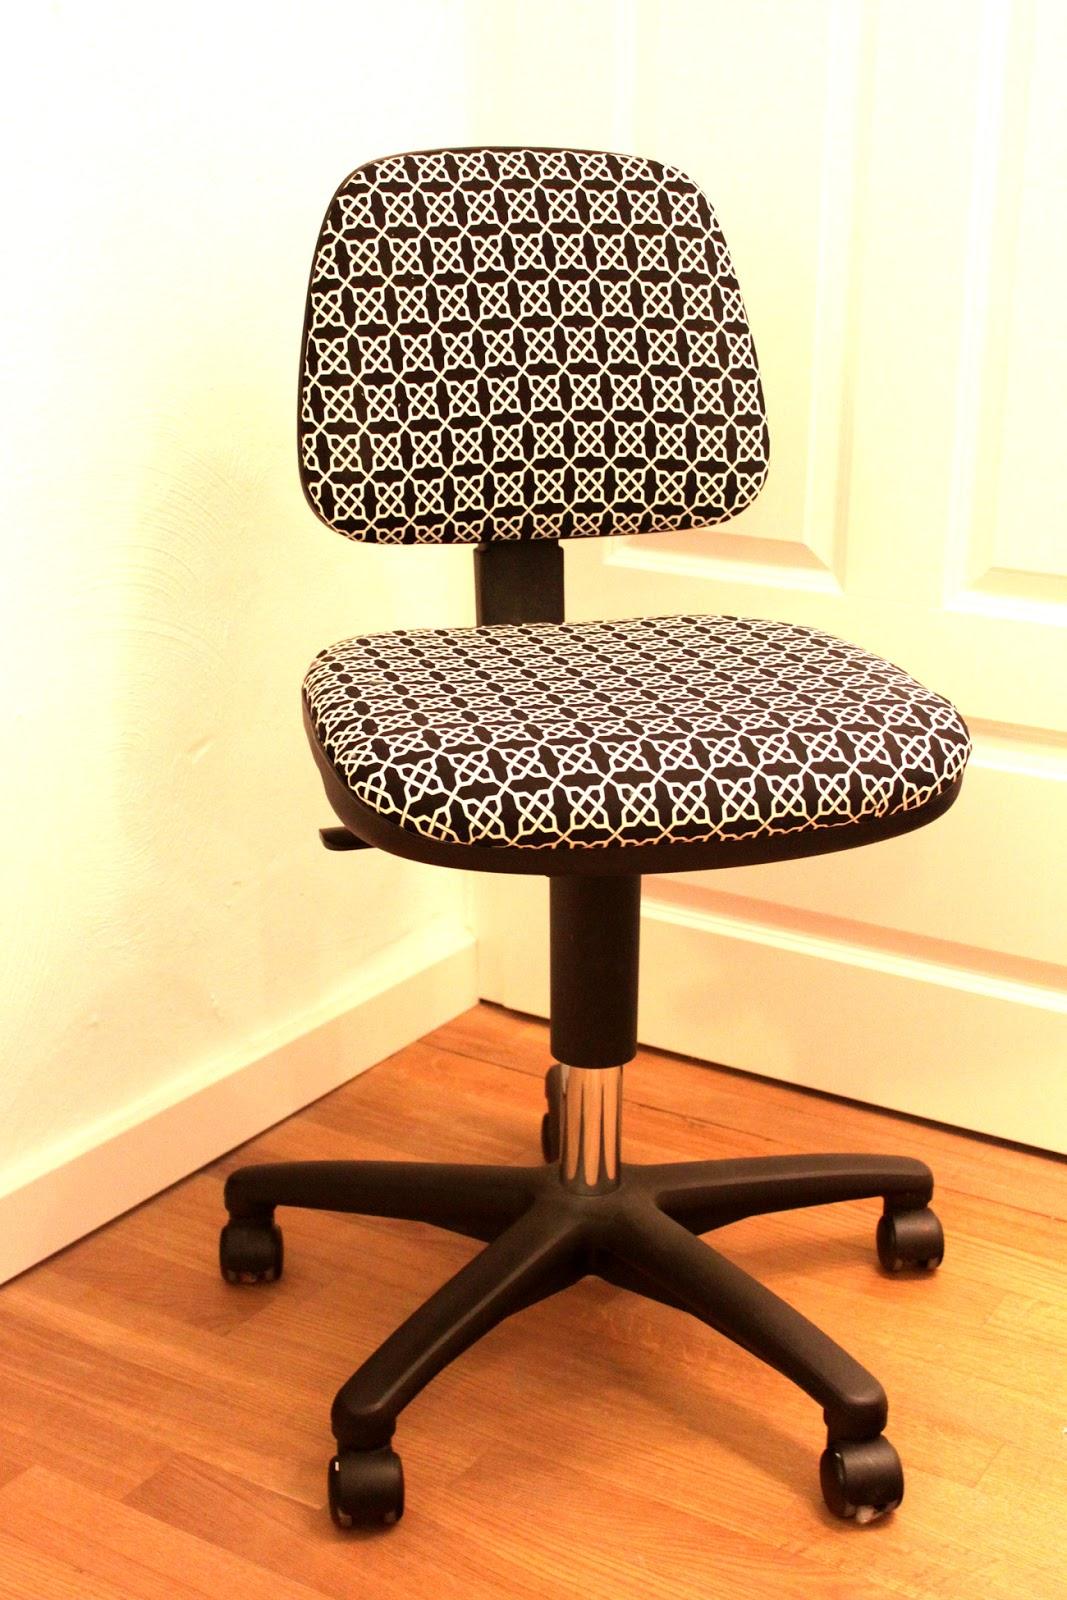 ikea drehstuhl neu beziehen. Black Bedroom Furniture Sets. Home Design Ideas